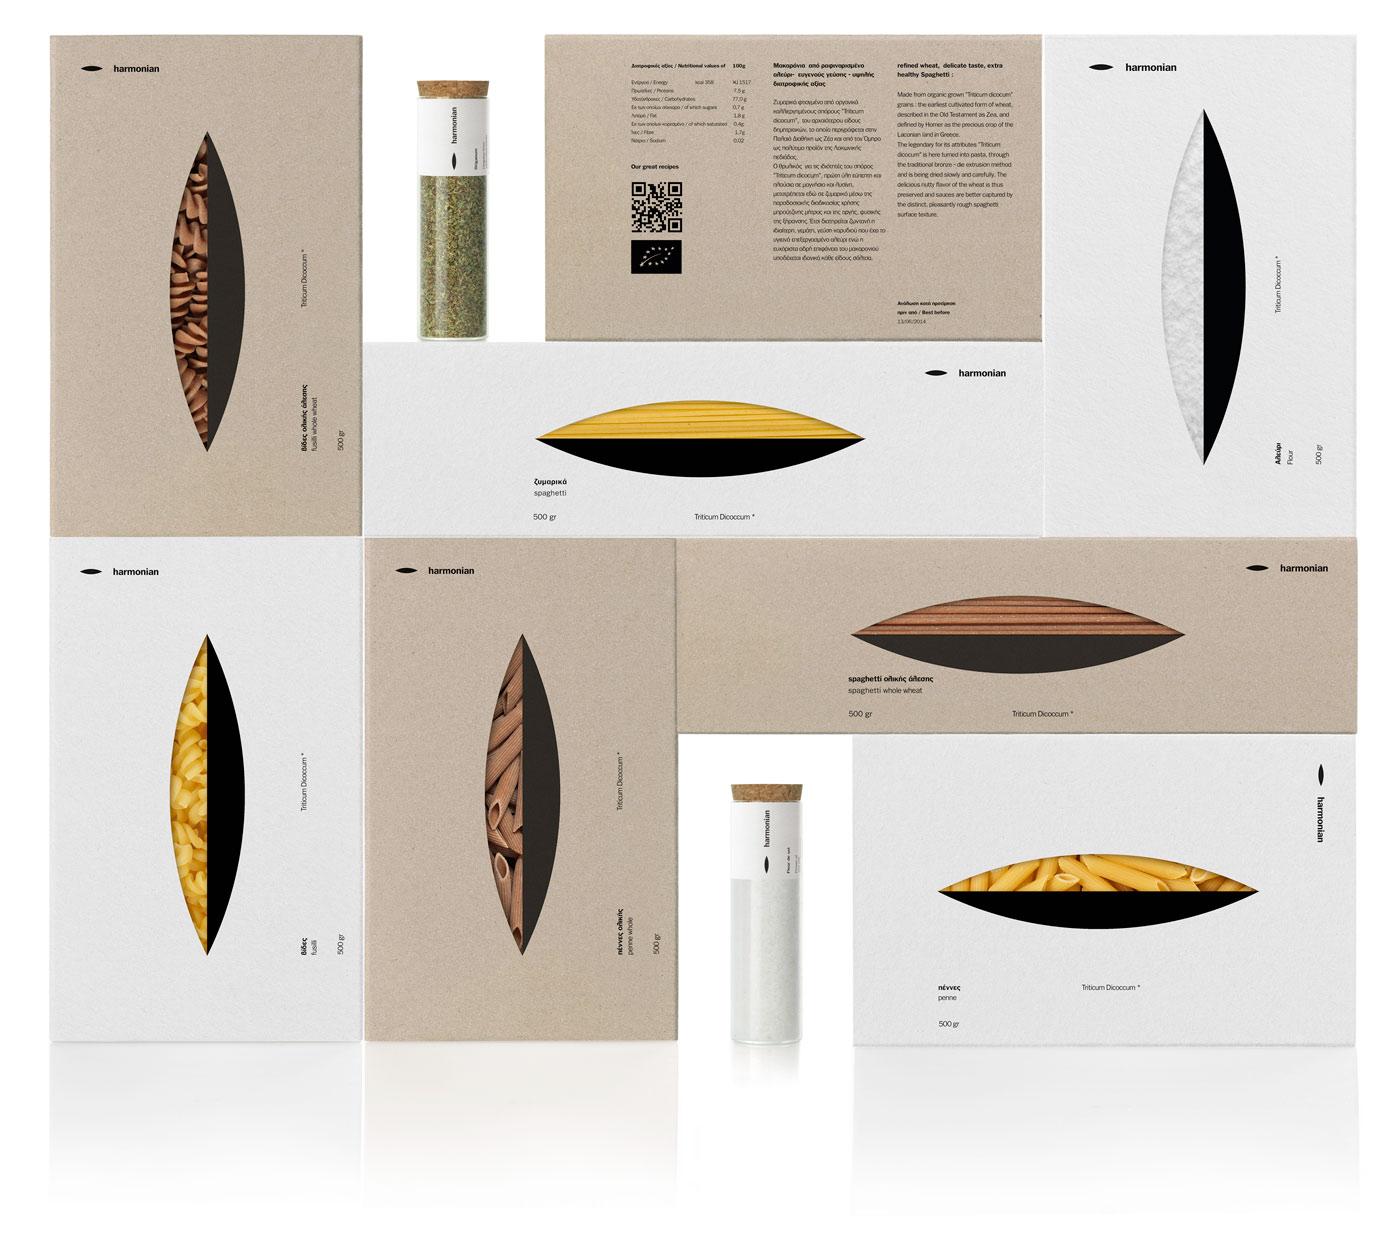 mousegraphics-diseno-oldskull-26